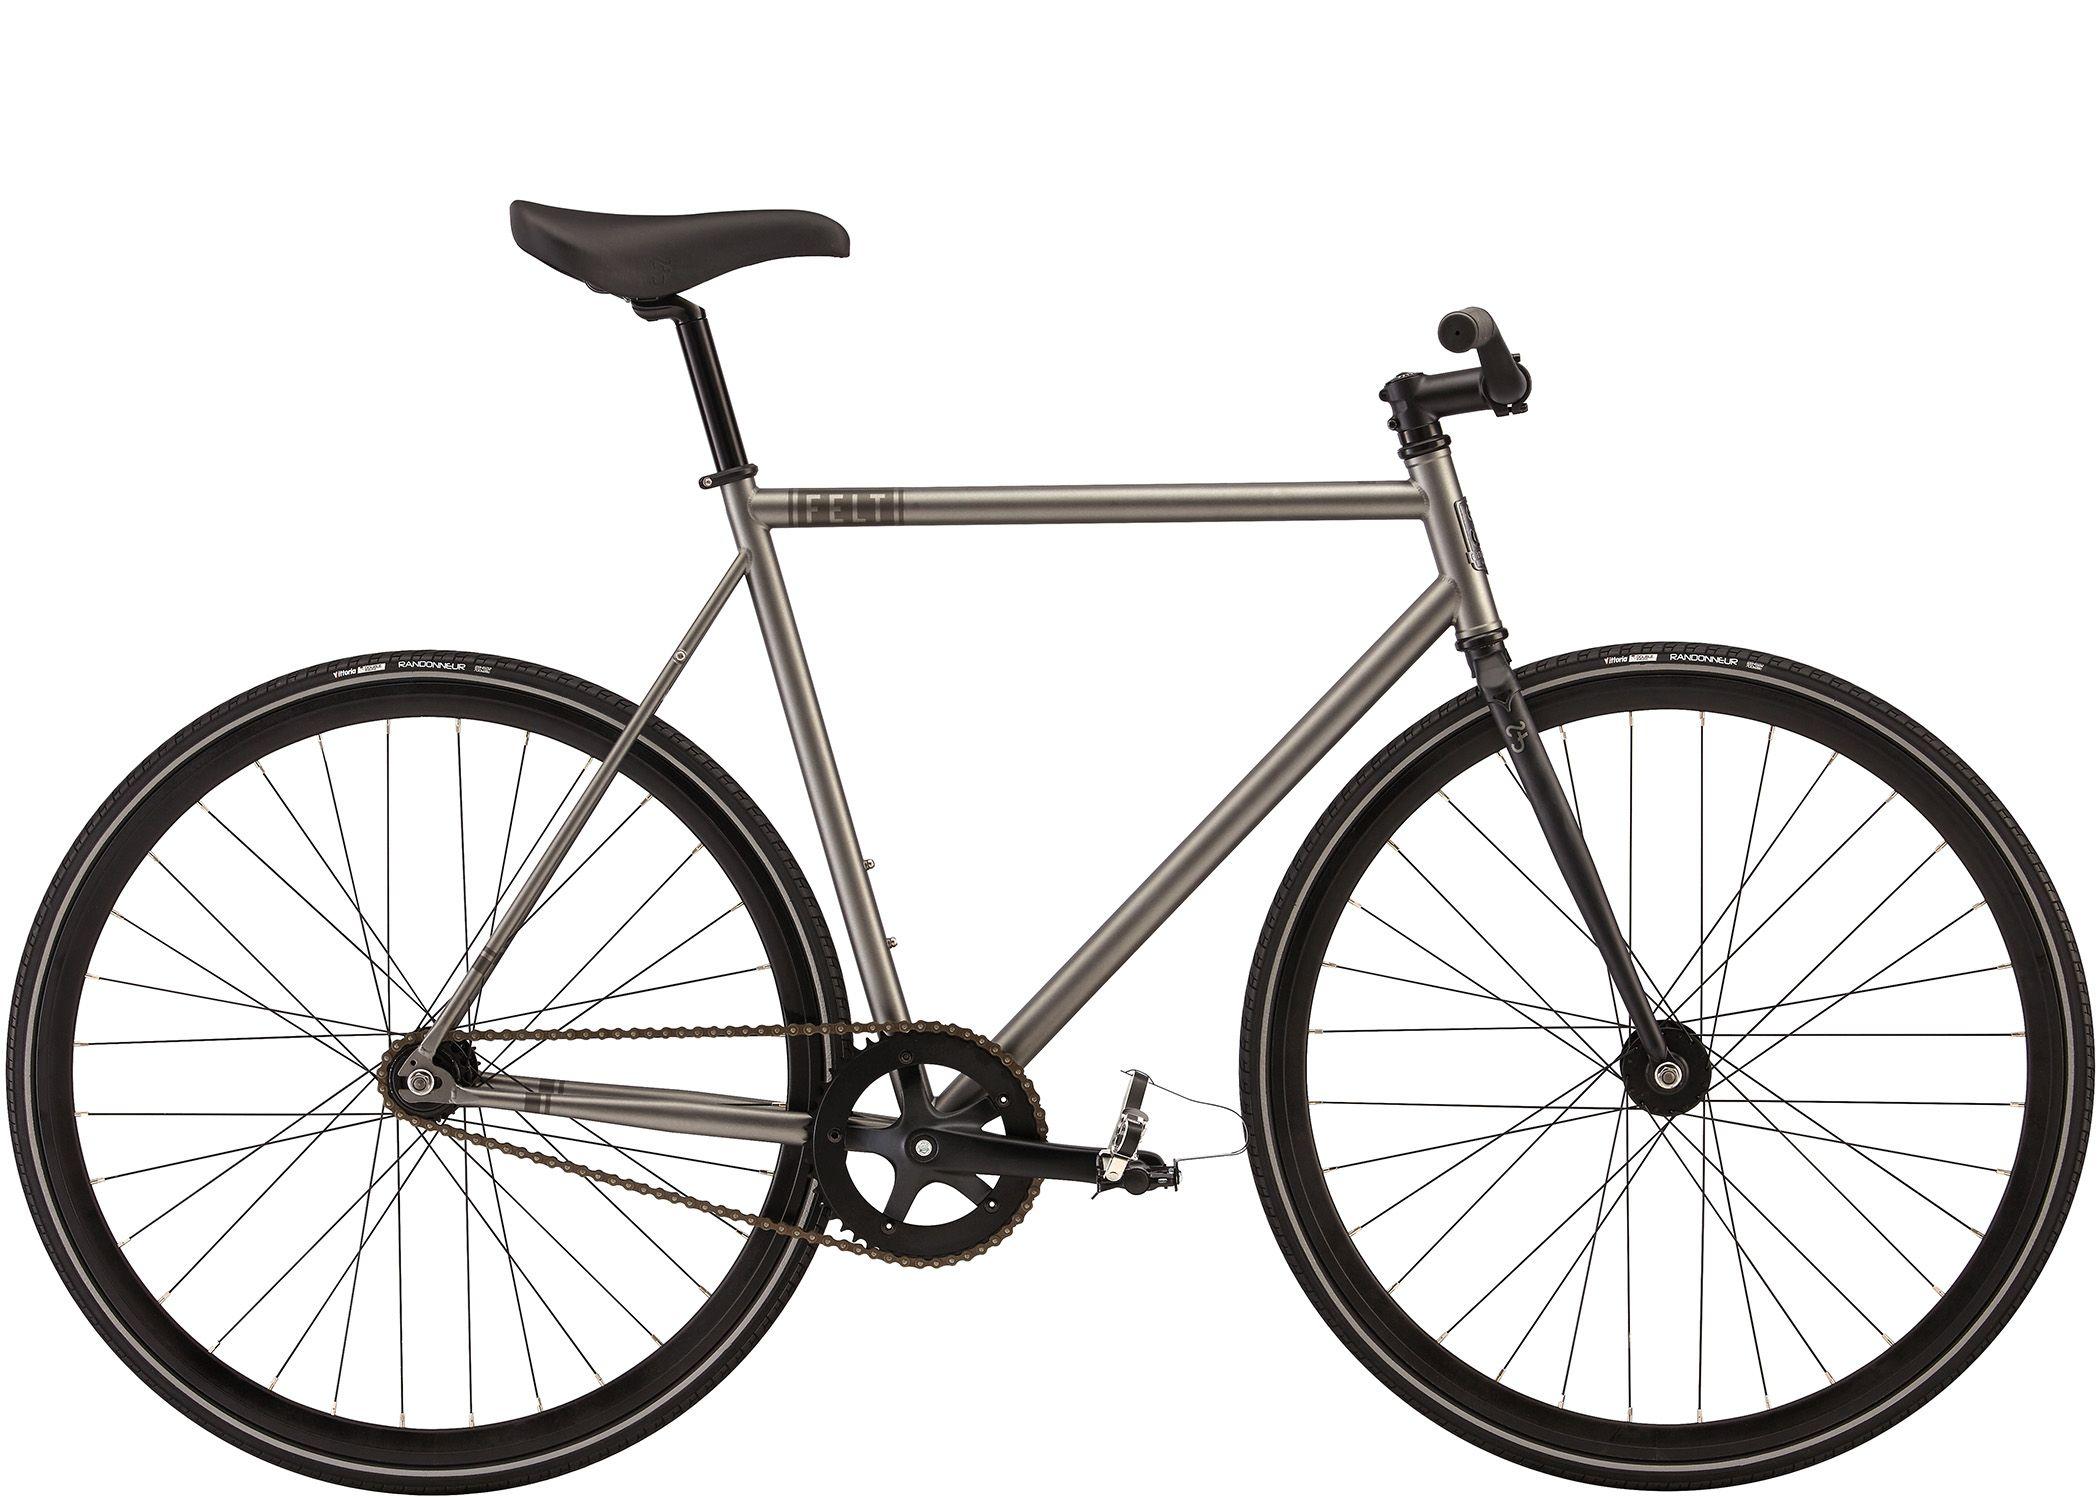 Brougham Felt Bicycles